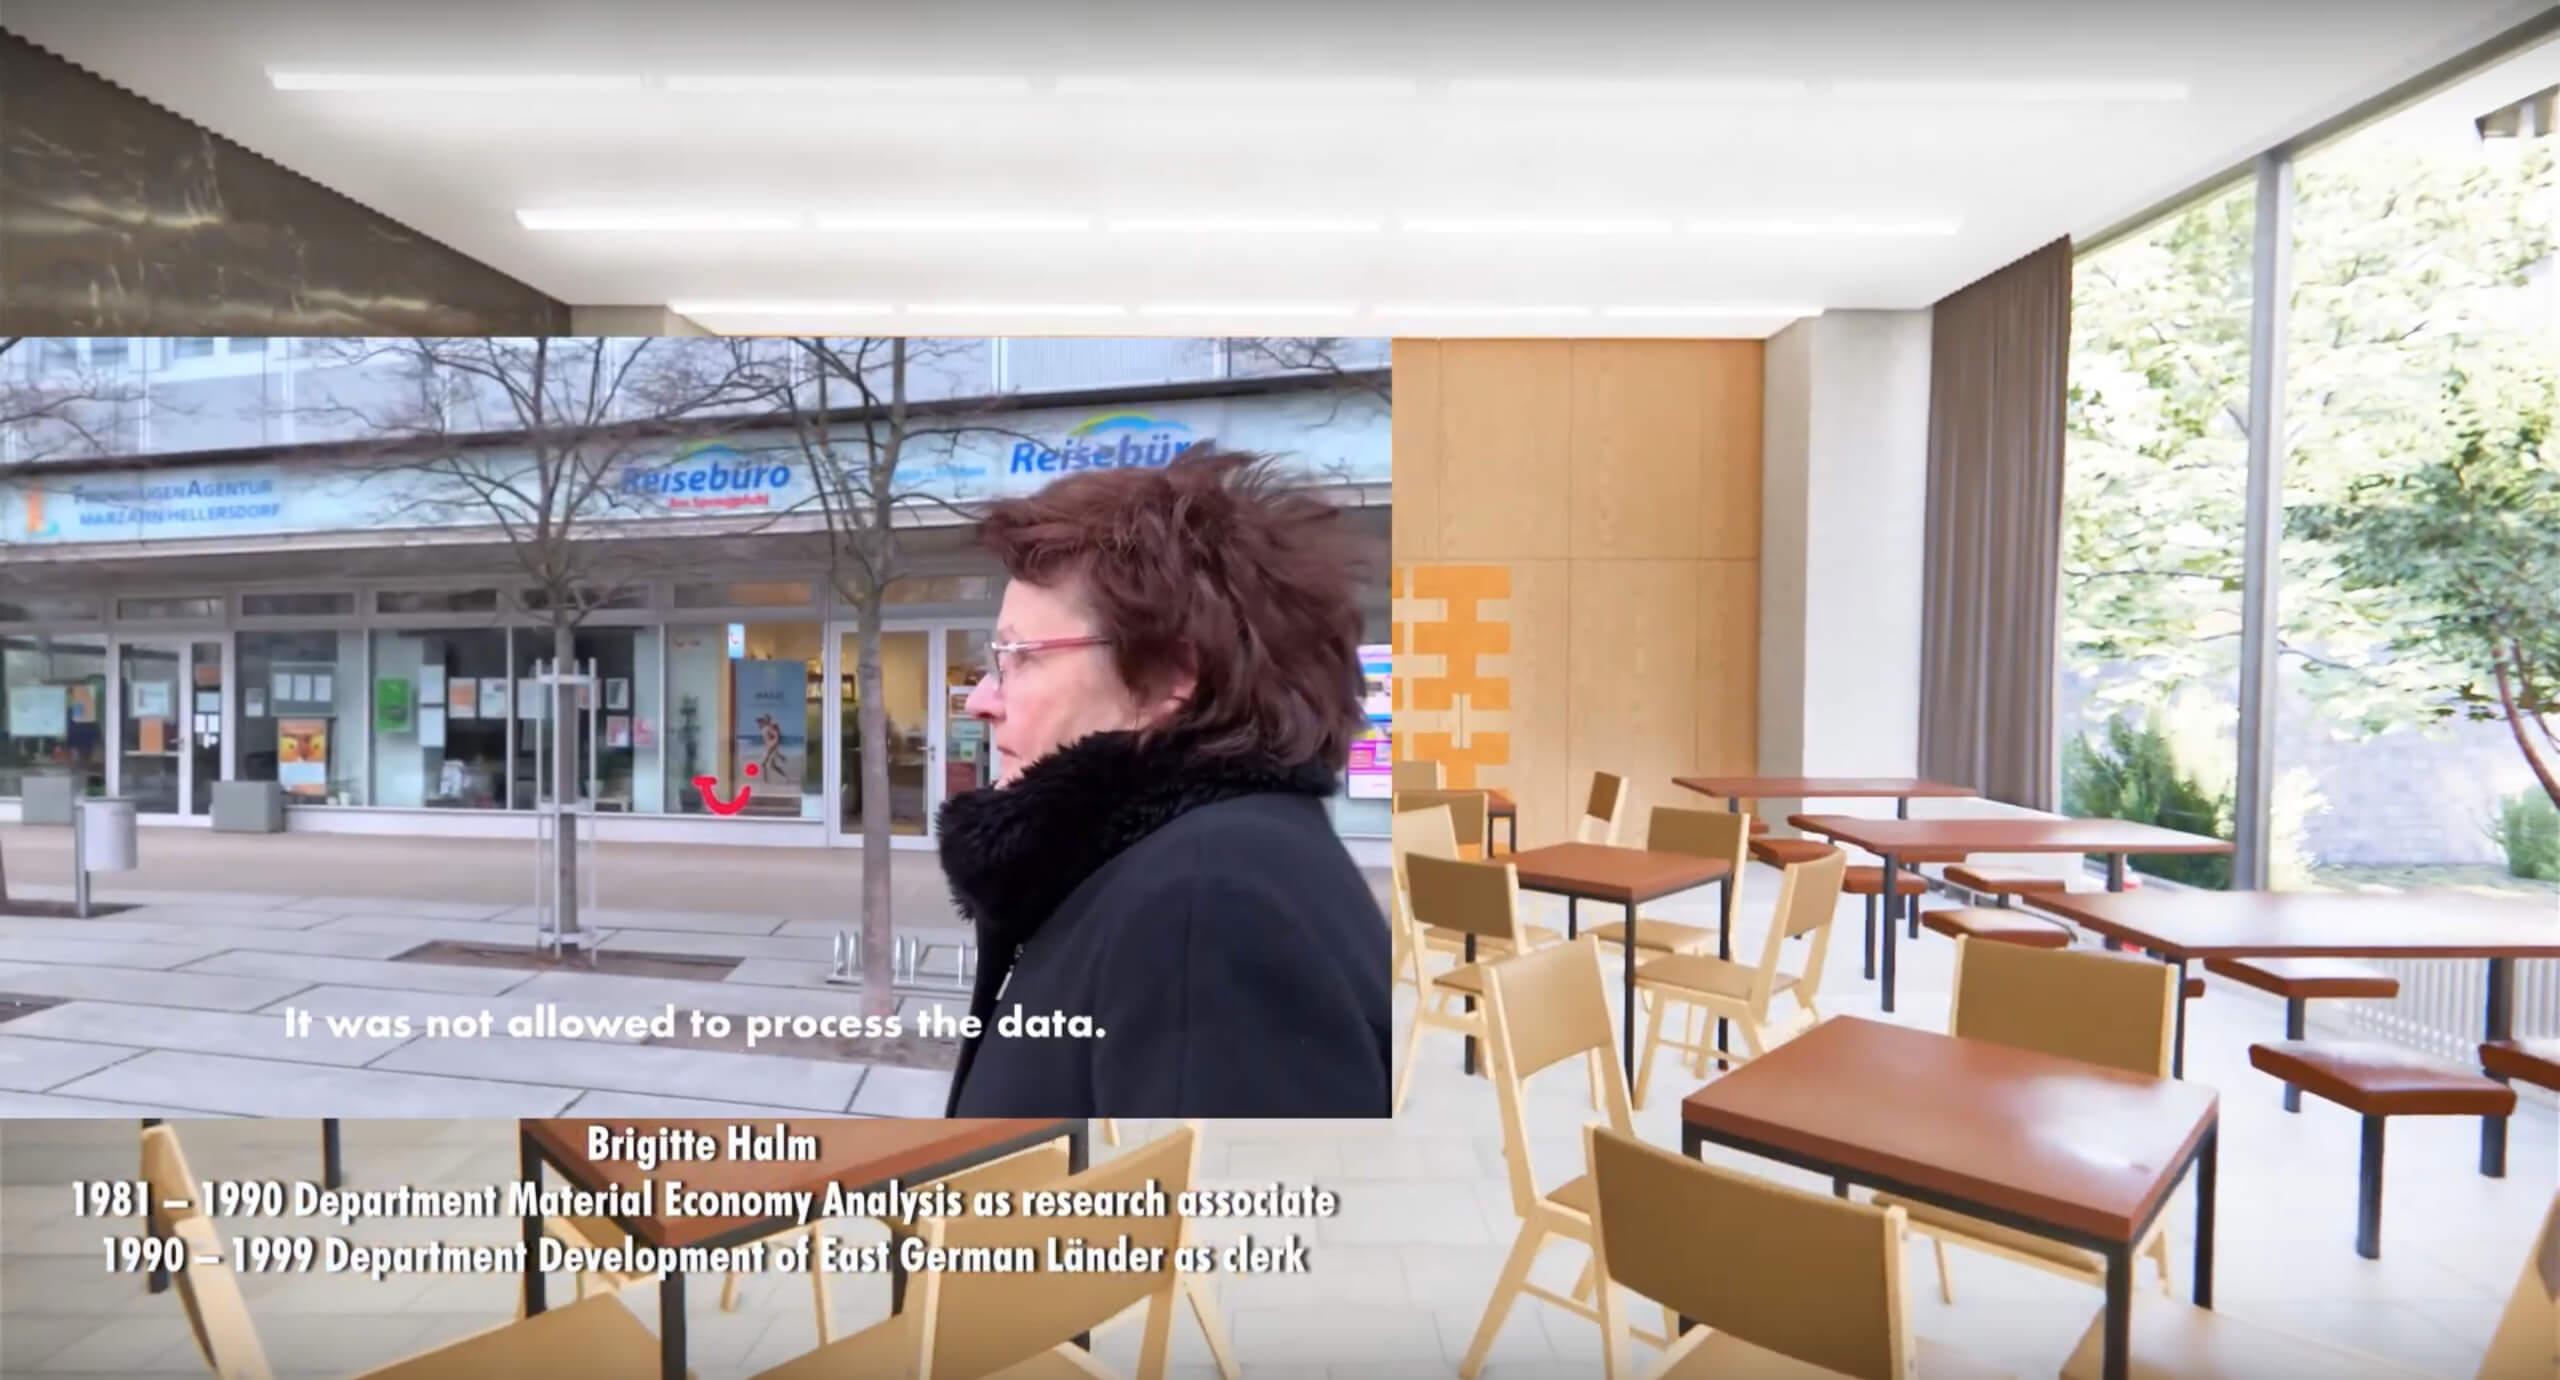 HdS-Ausstellung_Statistiker sind die letzten Romantiker_April 2021_Kantine_Screenshot 2